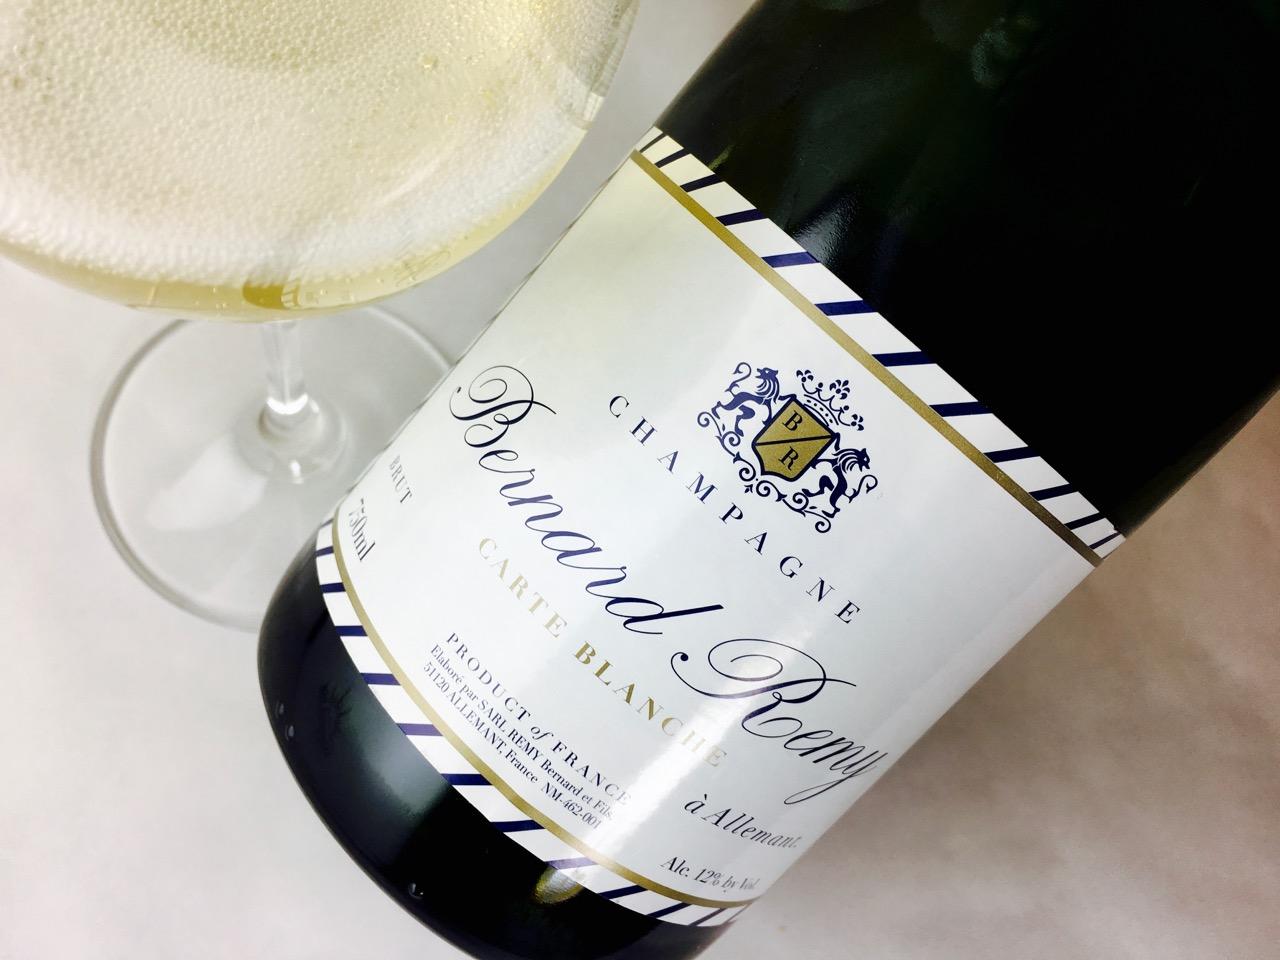 NV Bernard Remy Carte Blanche Brut Champagne